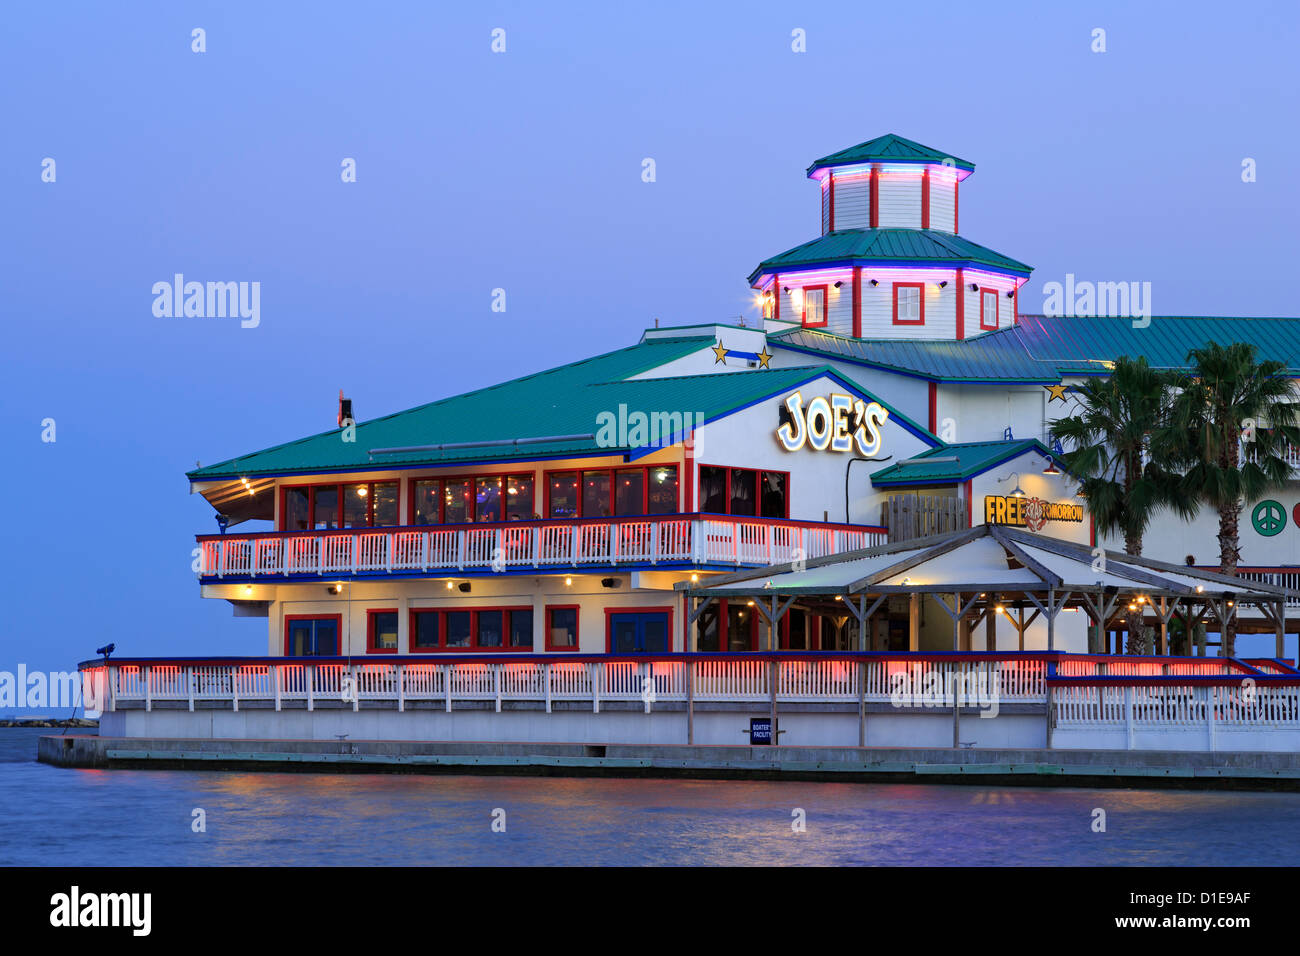 Joe's Crab Shack Restaurant, Corpus Christi, Texas, United States of America, North America - Stock Image